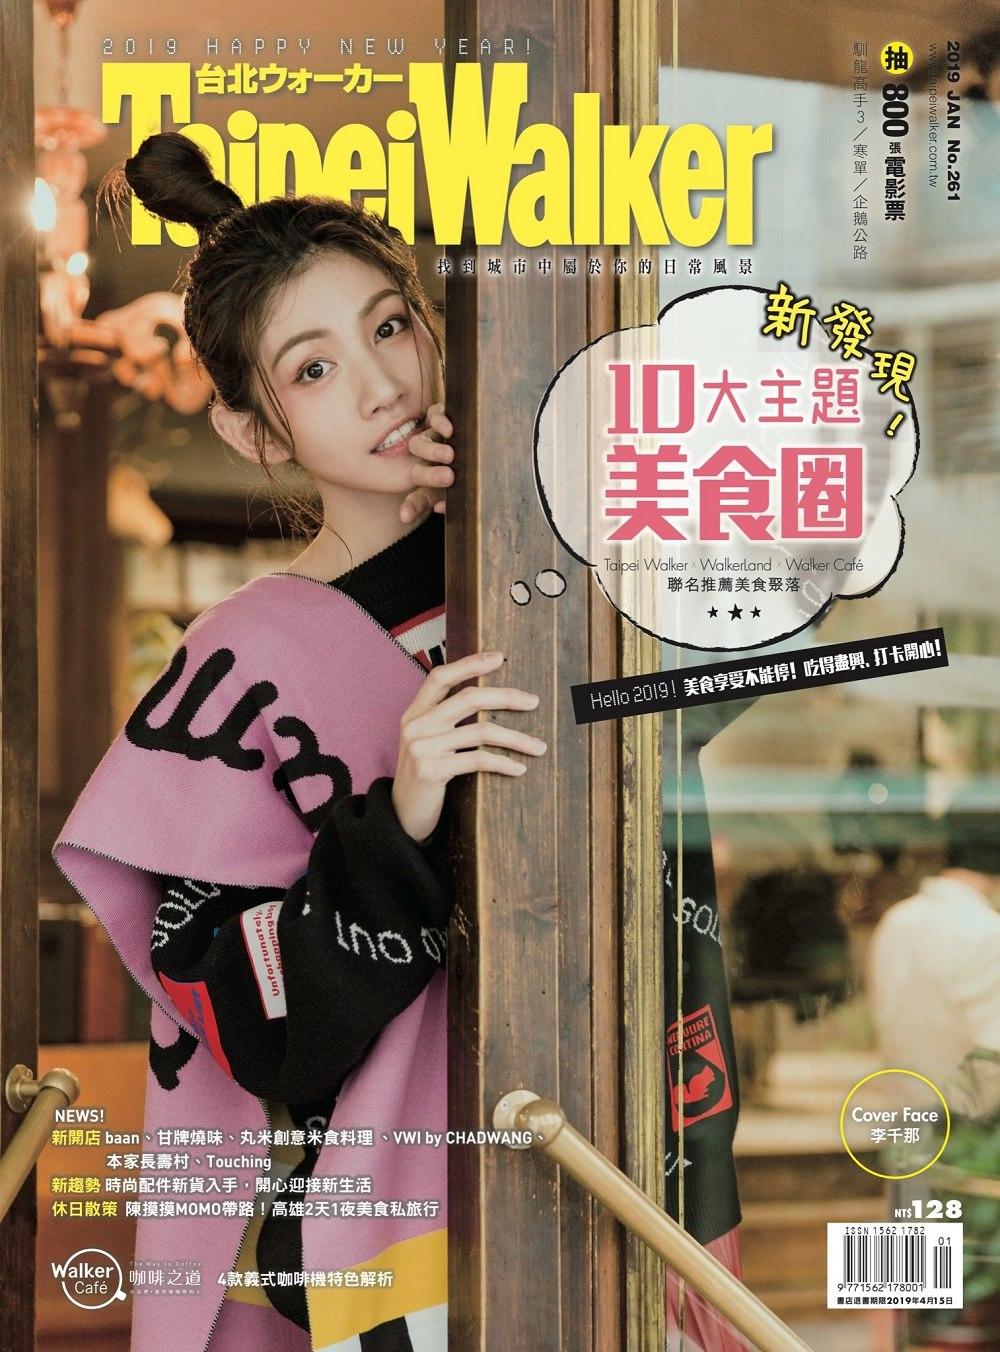 Taipei Walker 1月號/2019 第261期 贈:i phone 7/8 通用玻璃保護貼